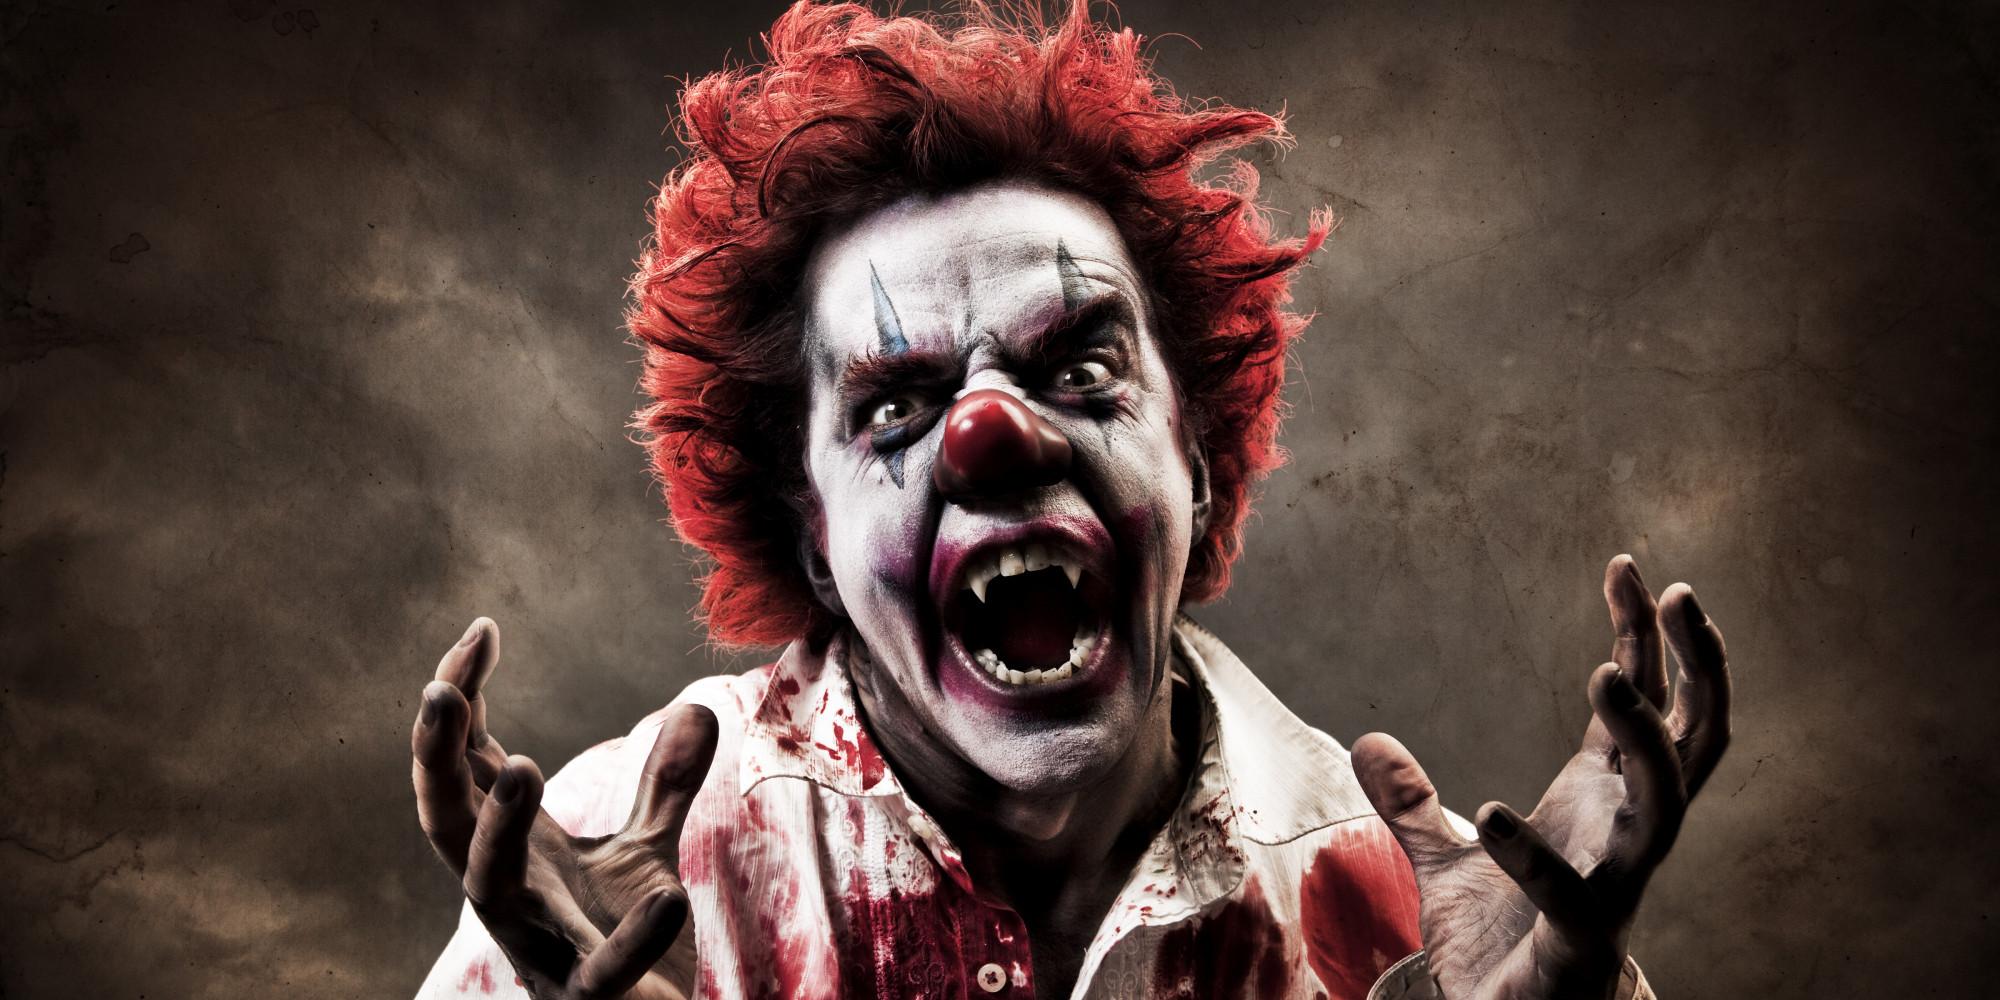 Ouchy The Clown